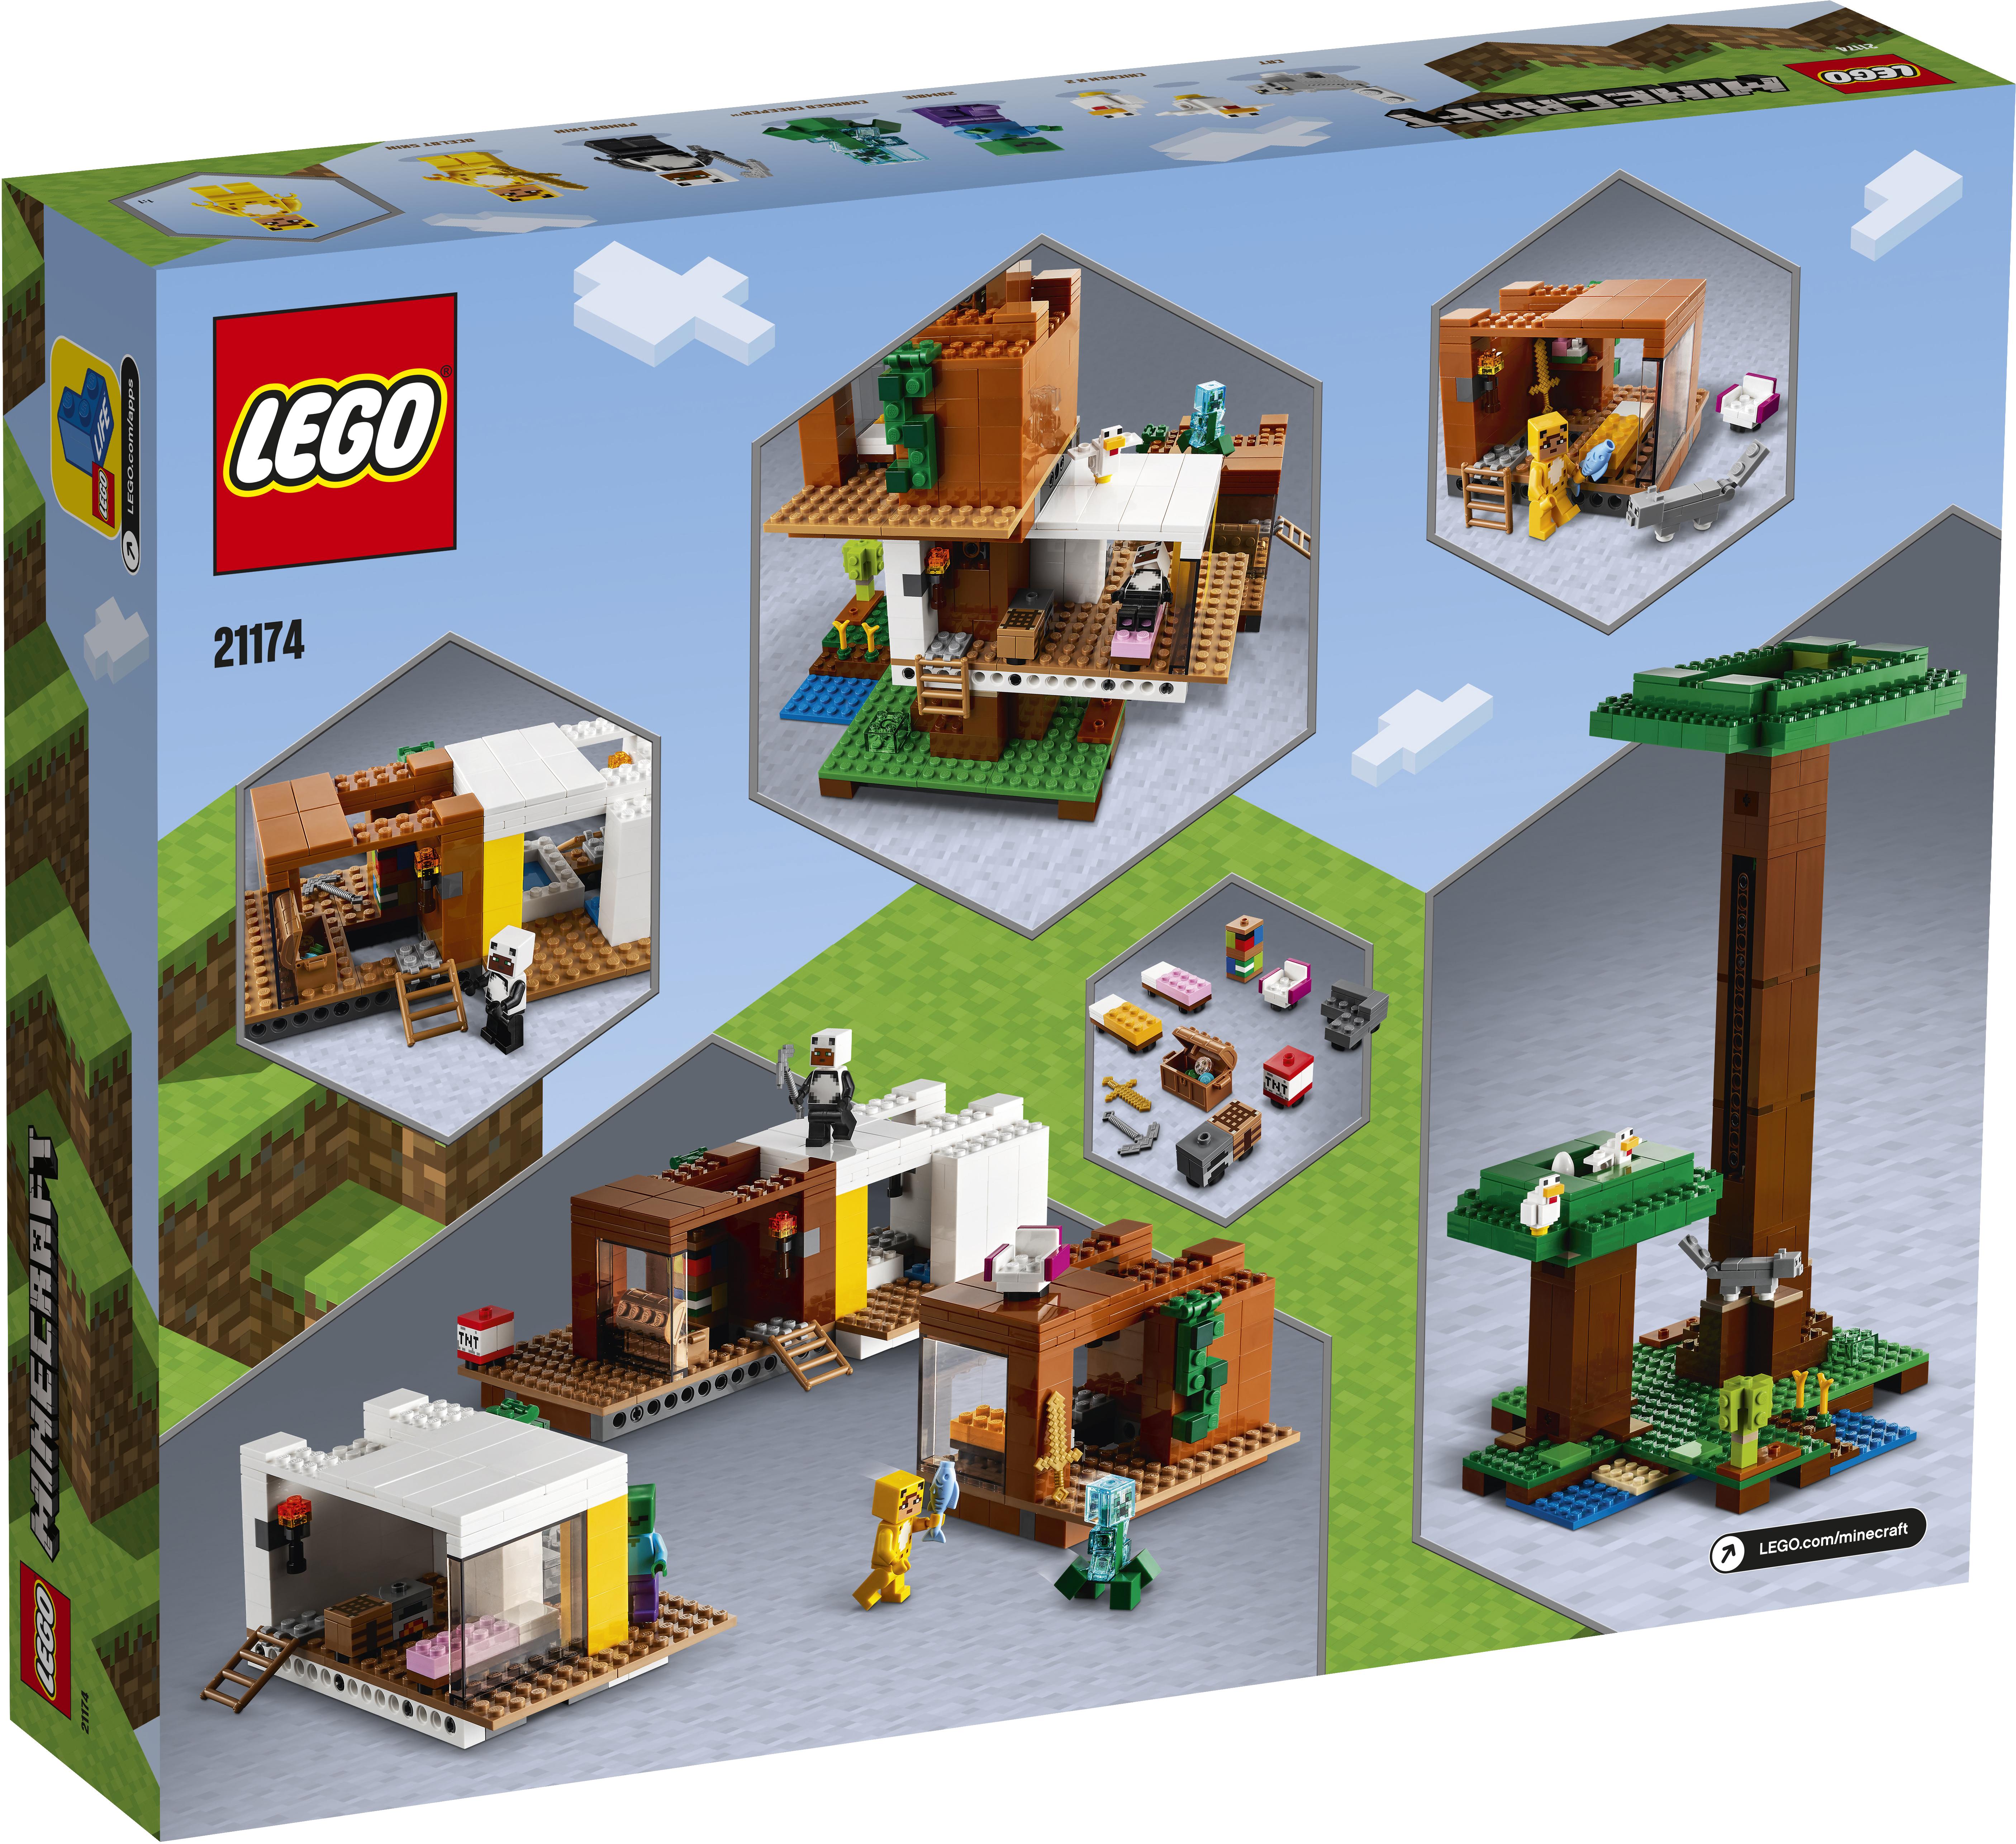 LEGO Minecraft Det moderne trætophus - 21174